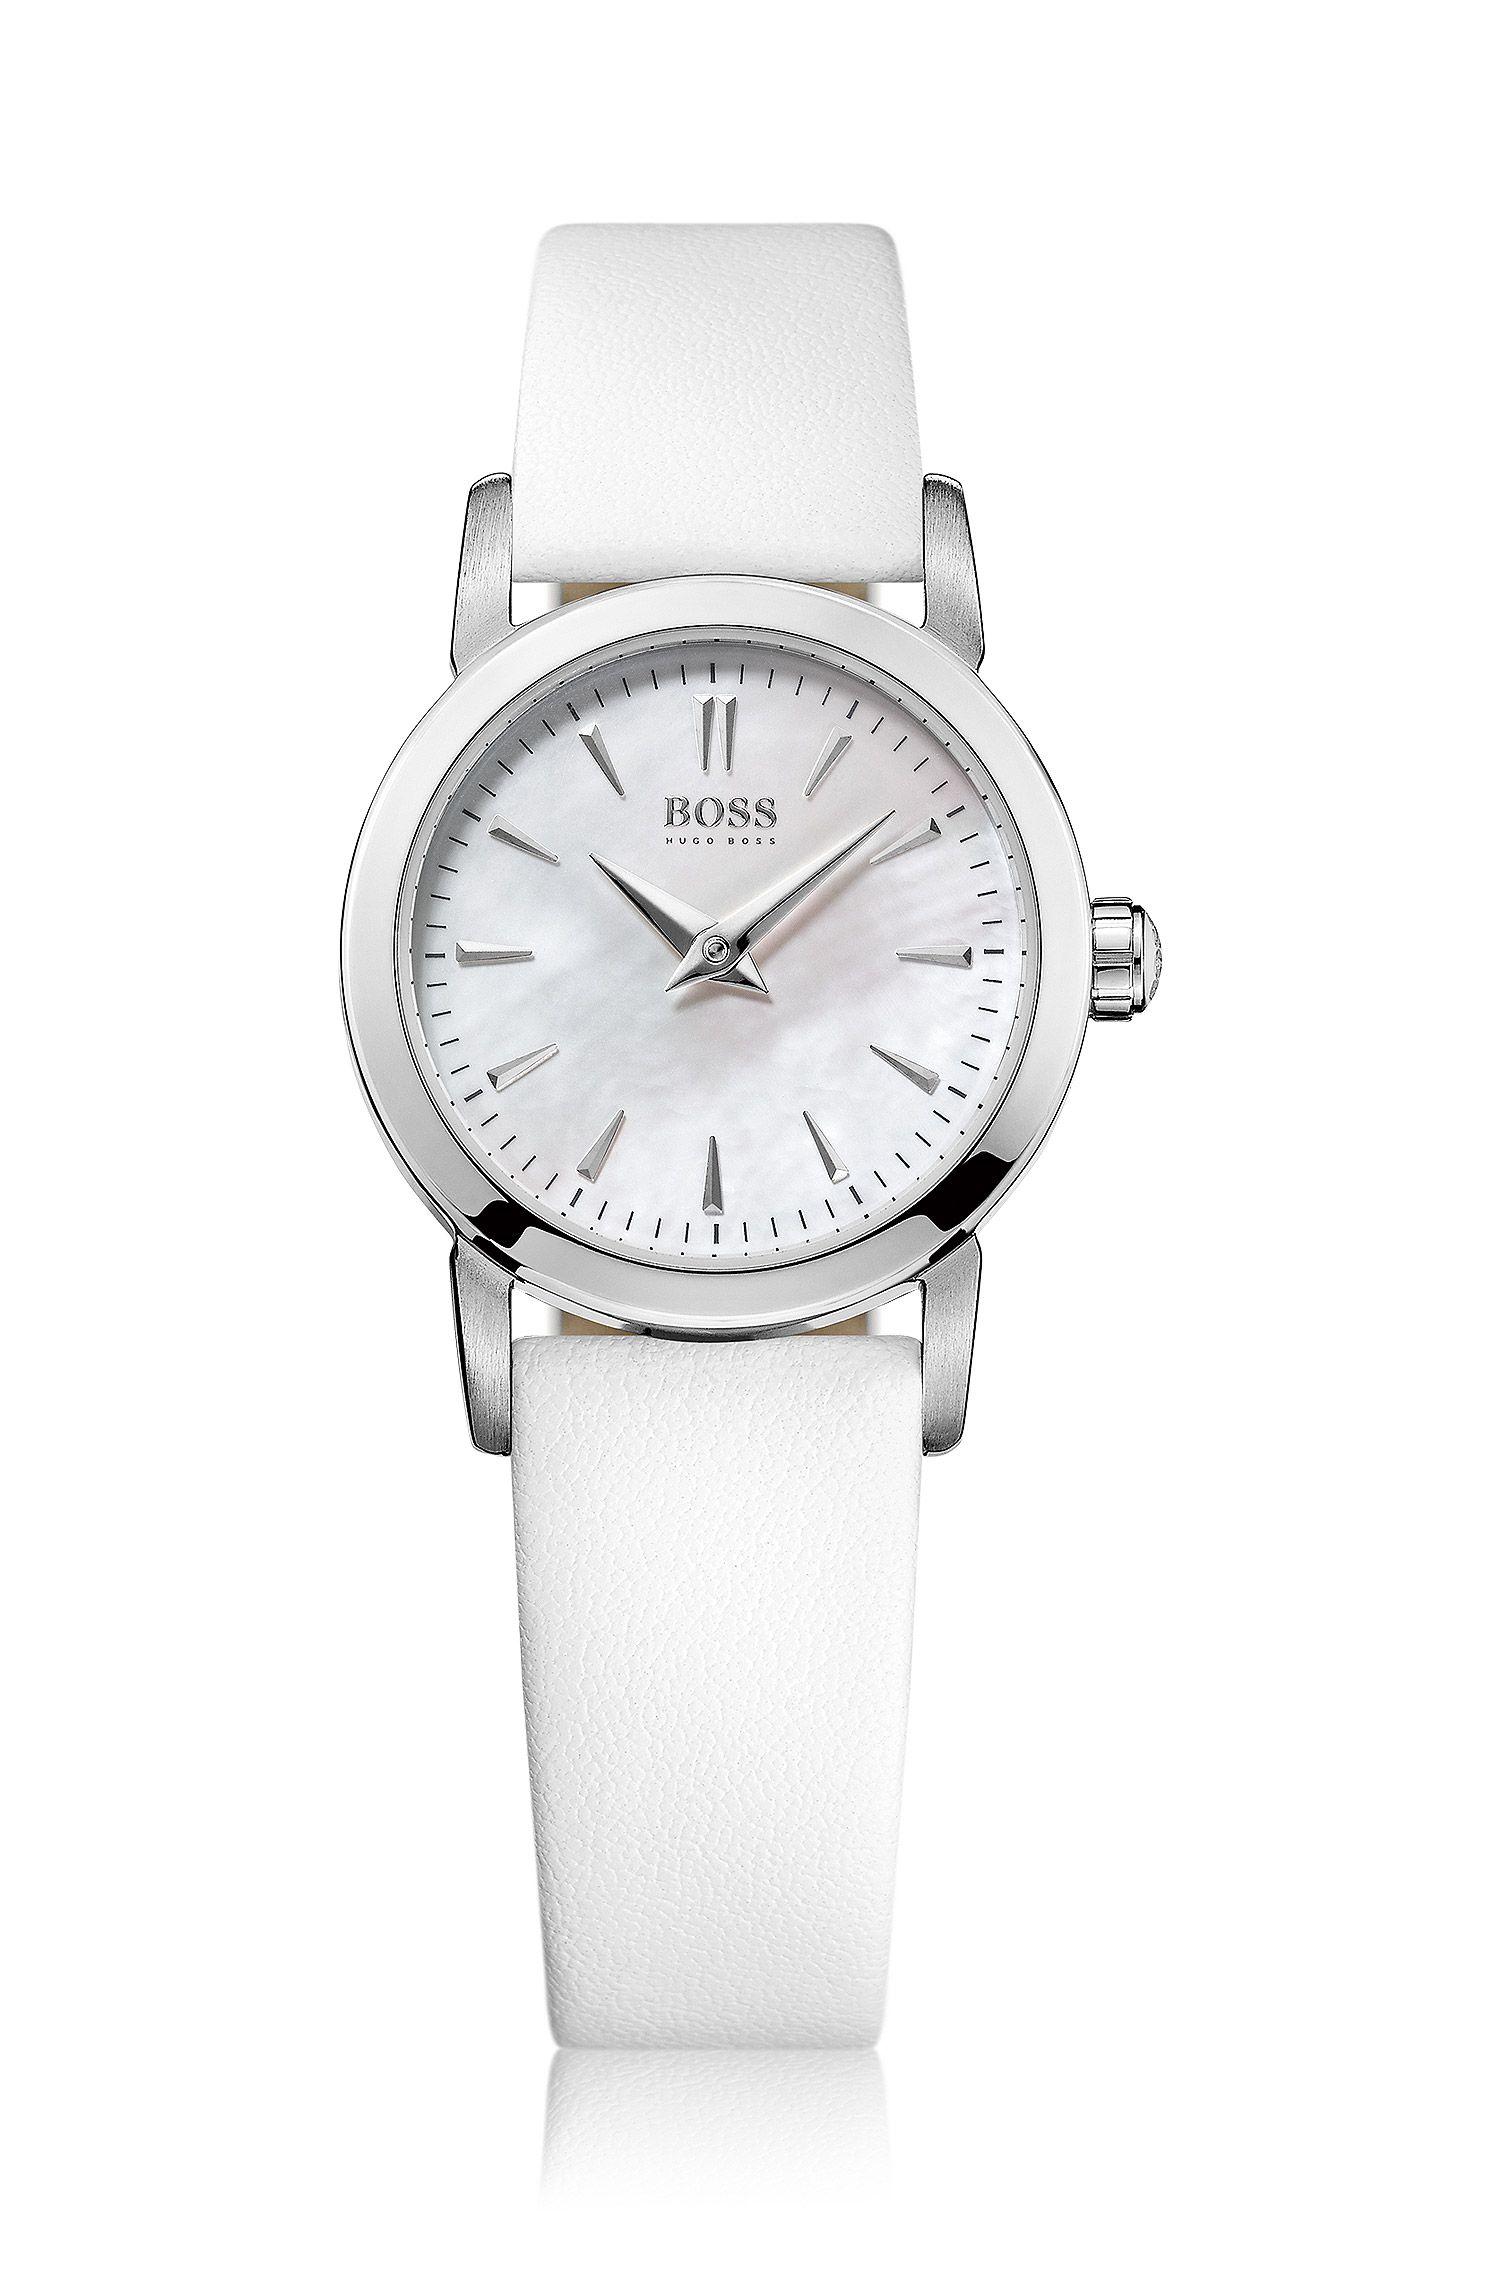 Montre-bracelet «HB6020» avec boîtier en acier inoxydable